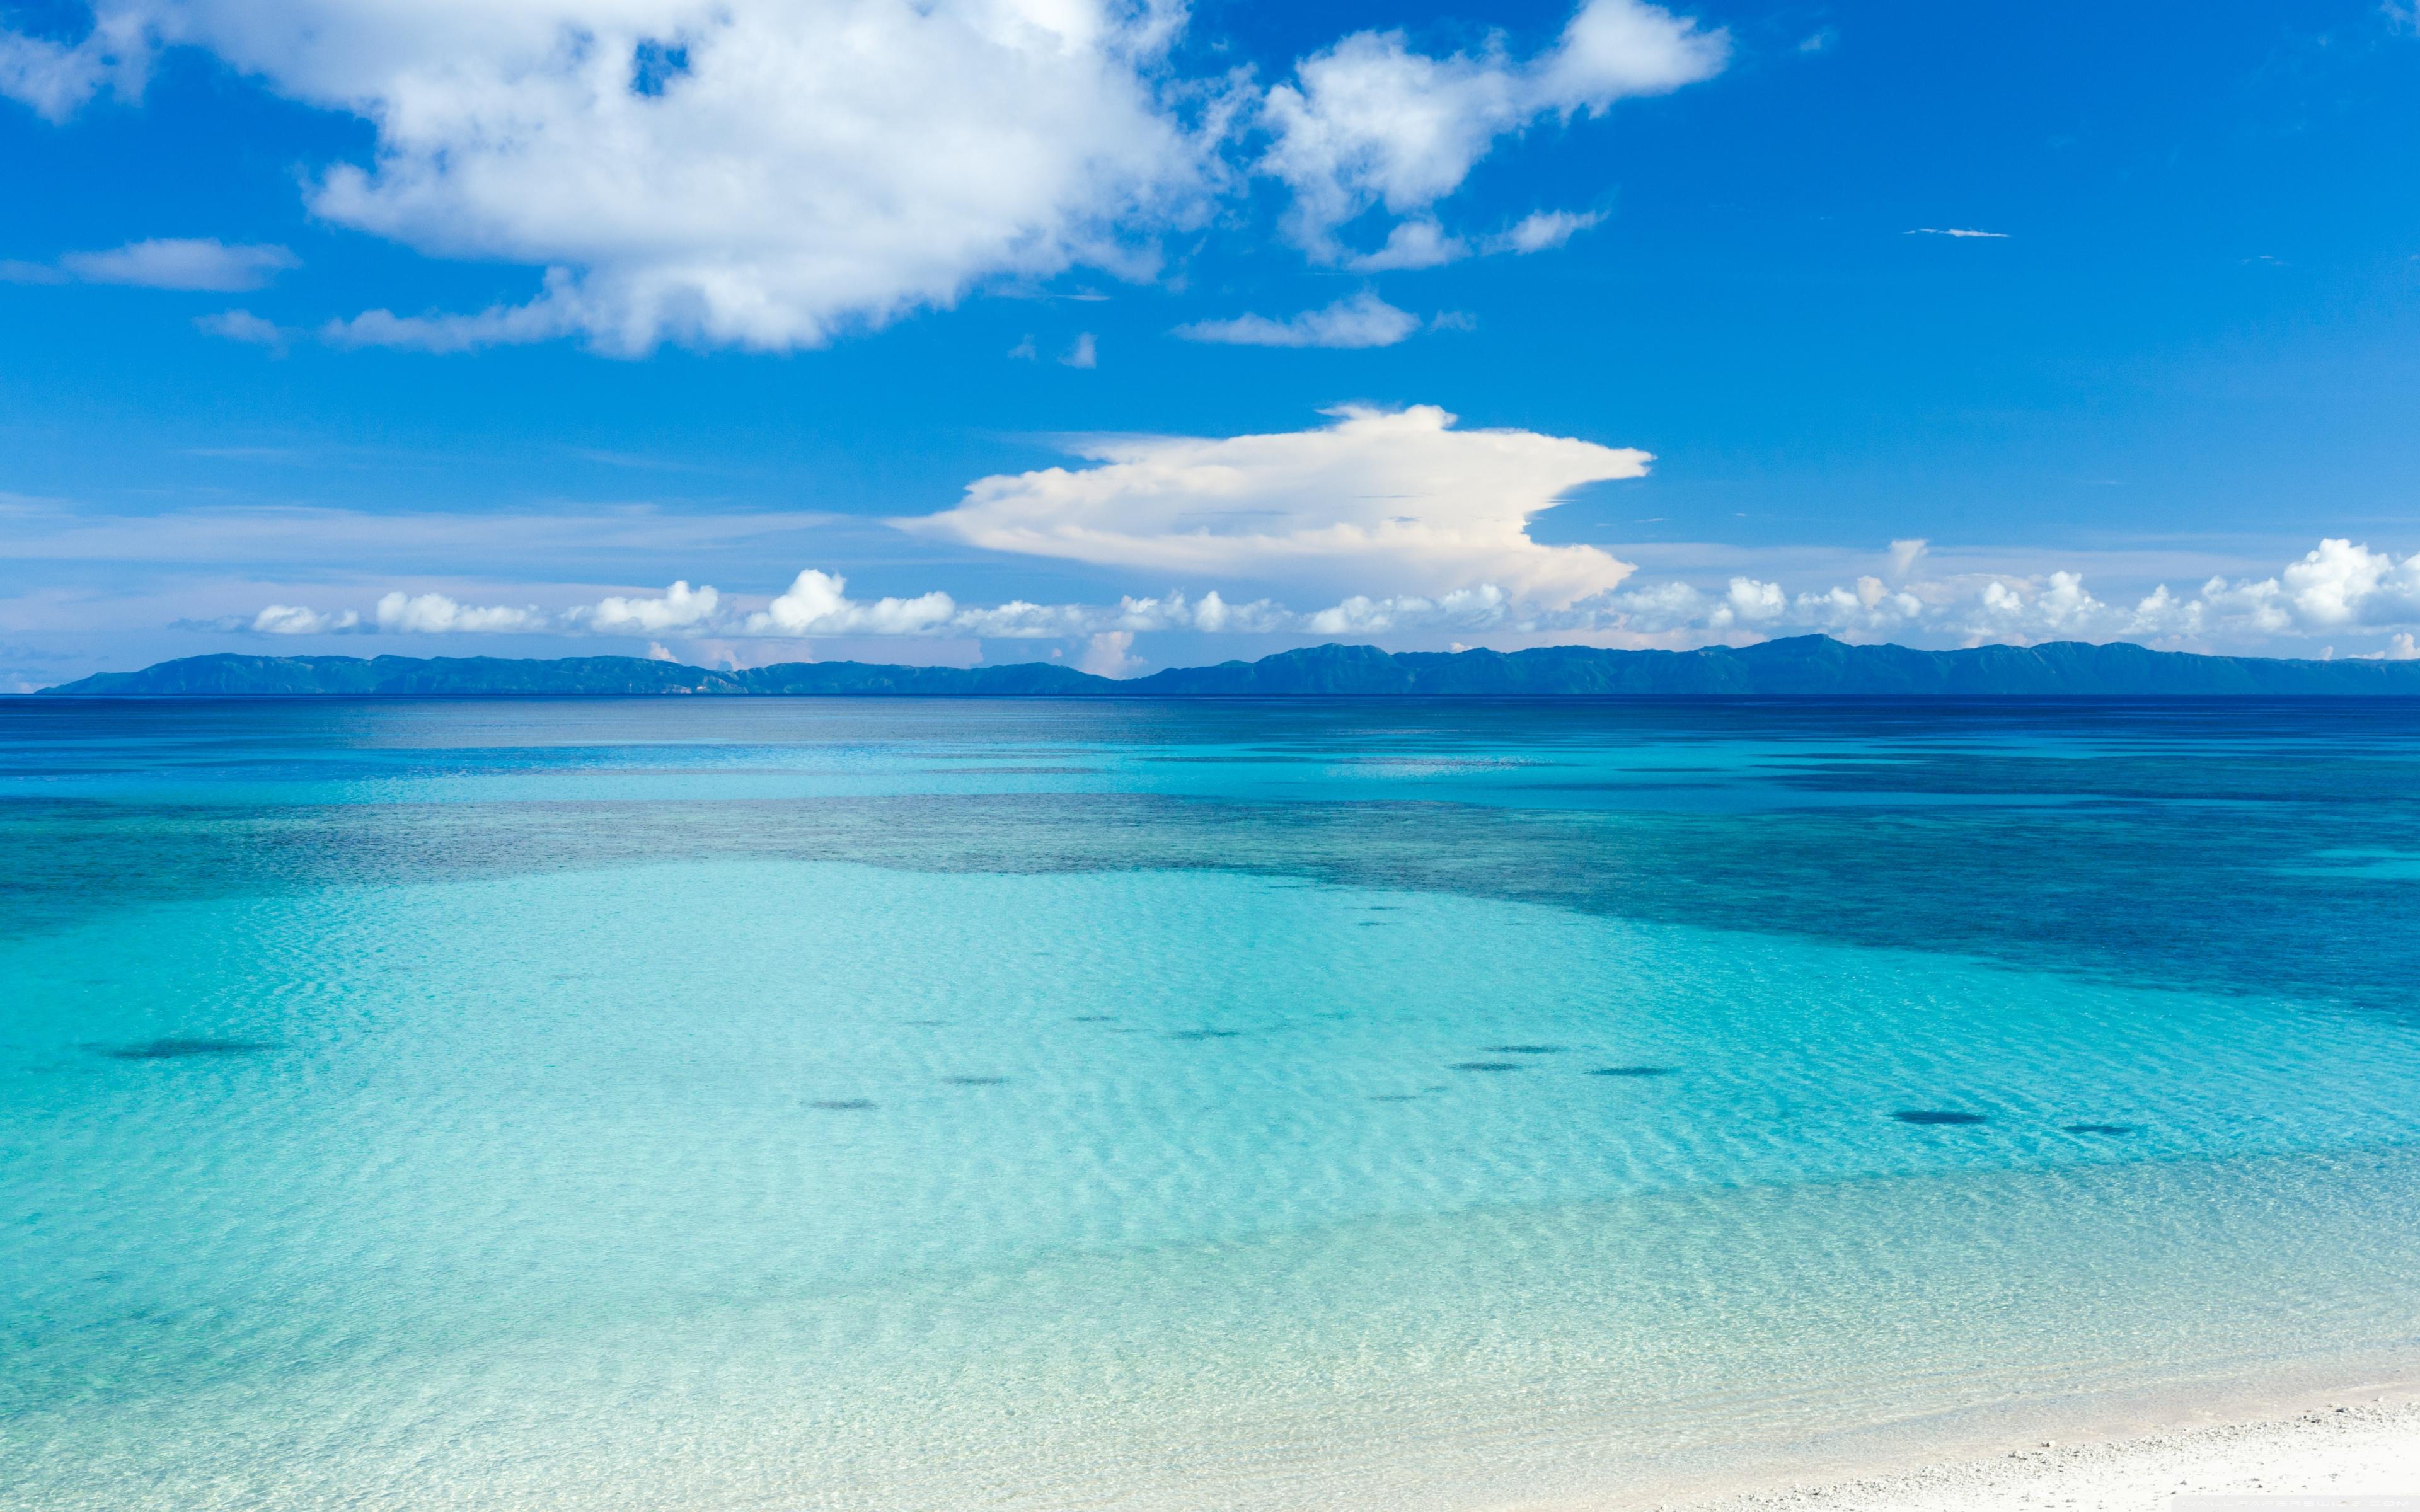 Island Beach Panoramic View 4K HD Desktop Wallpaper for 4K 3840x2400